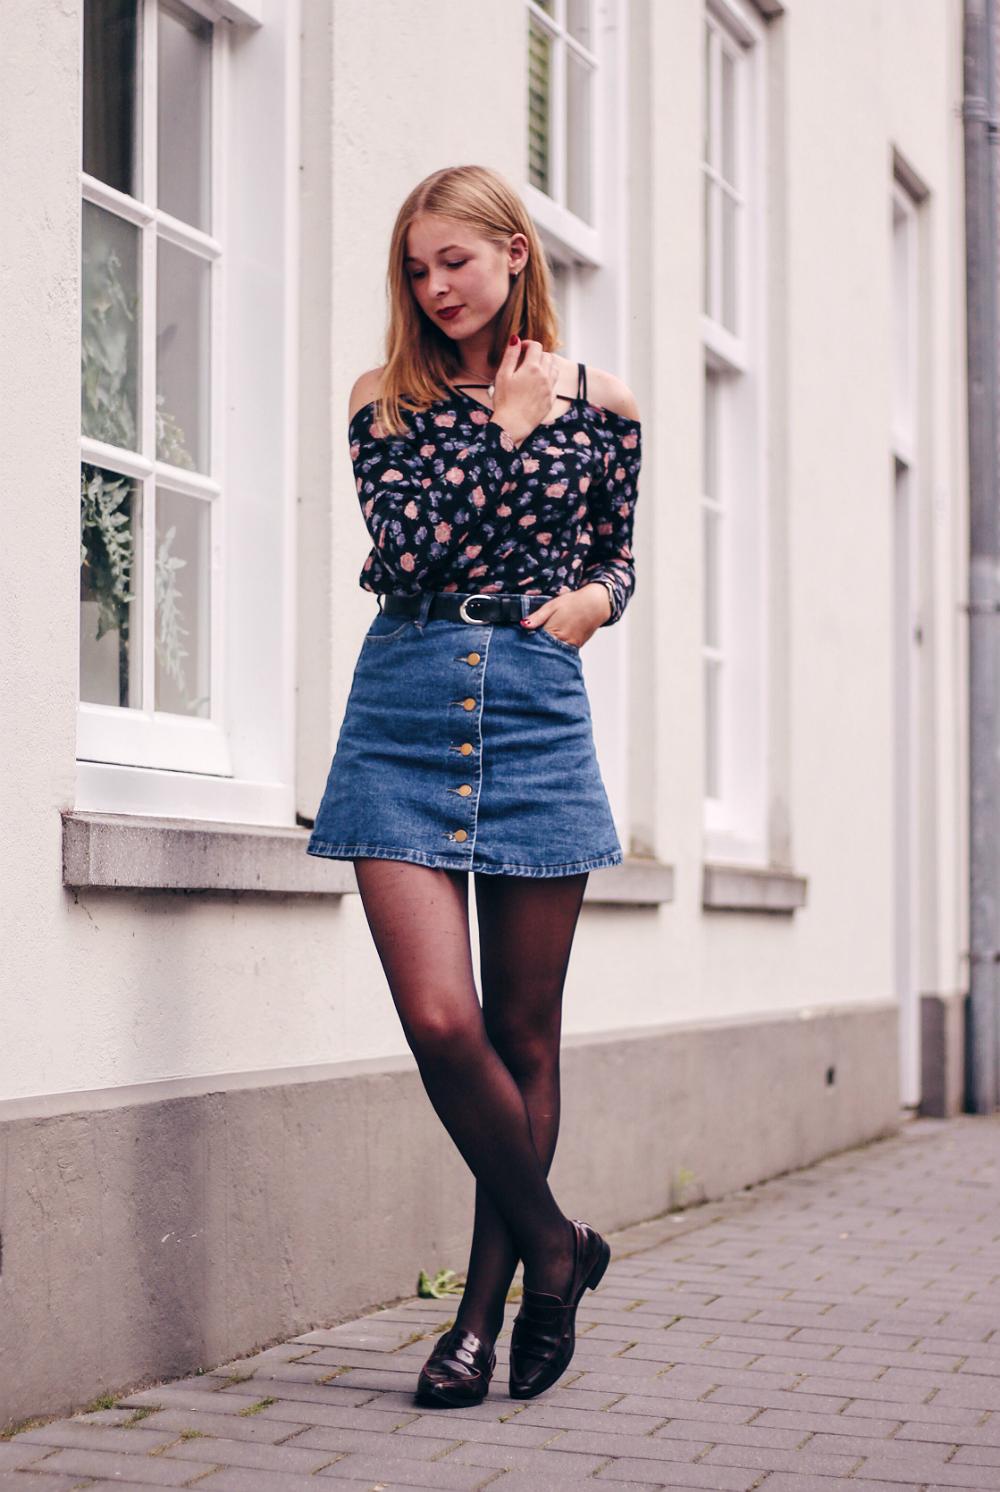 Fashion week Shirt Denim and black skirt for girls